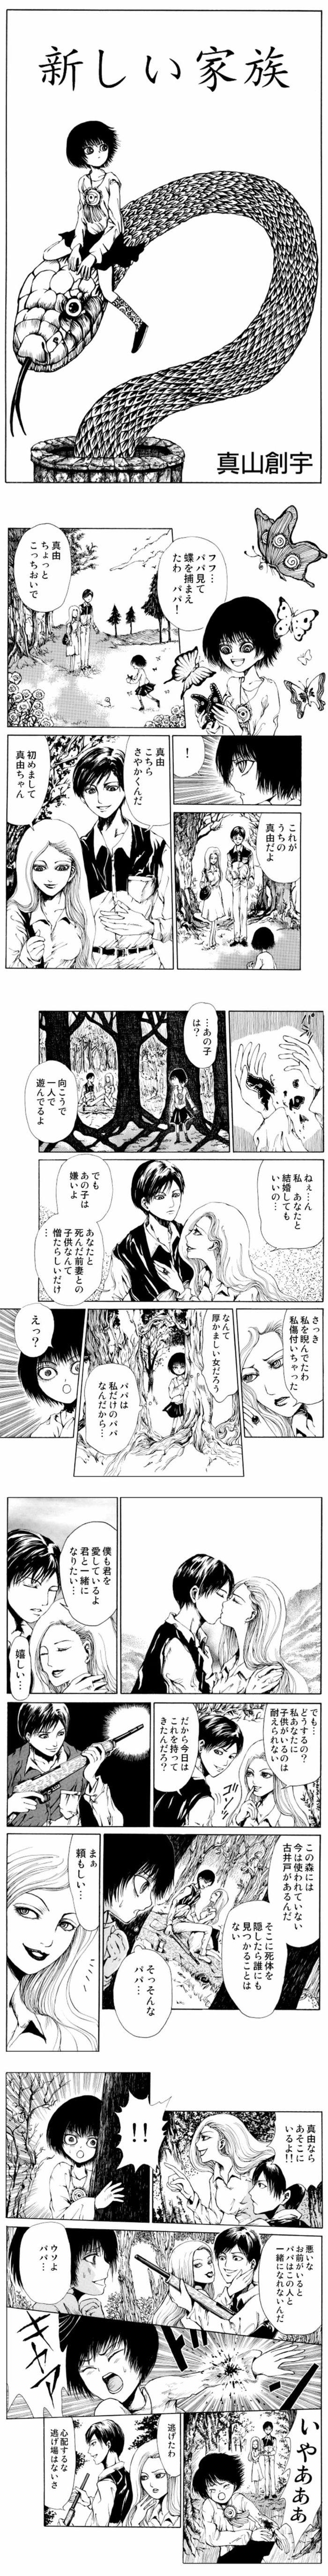 horror-gekijou01-01